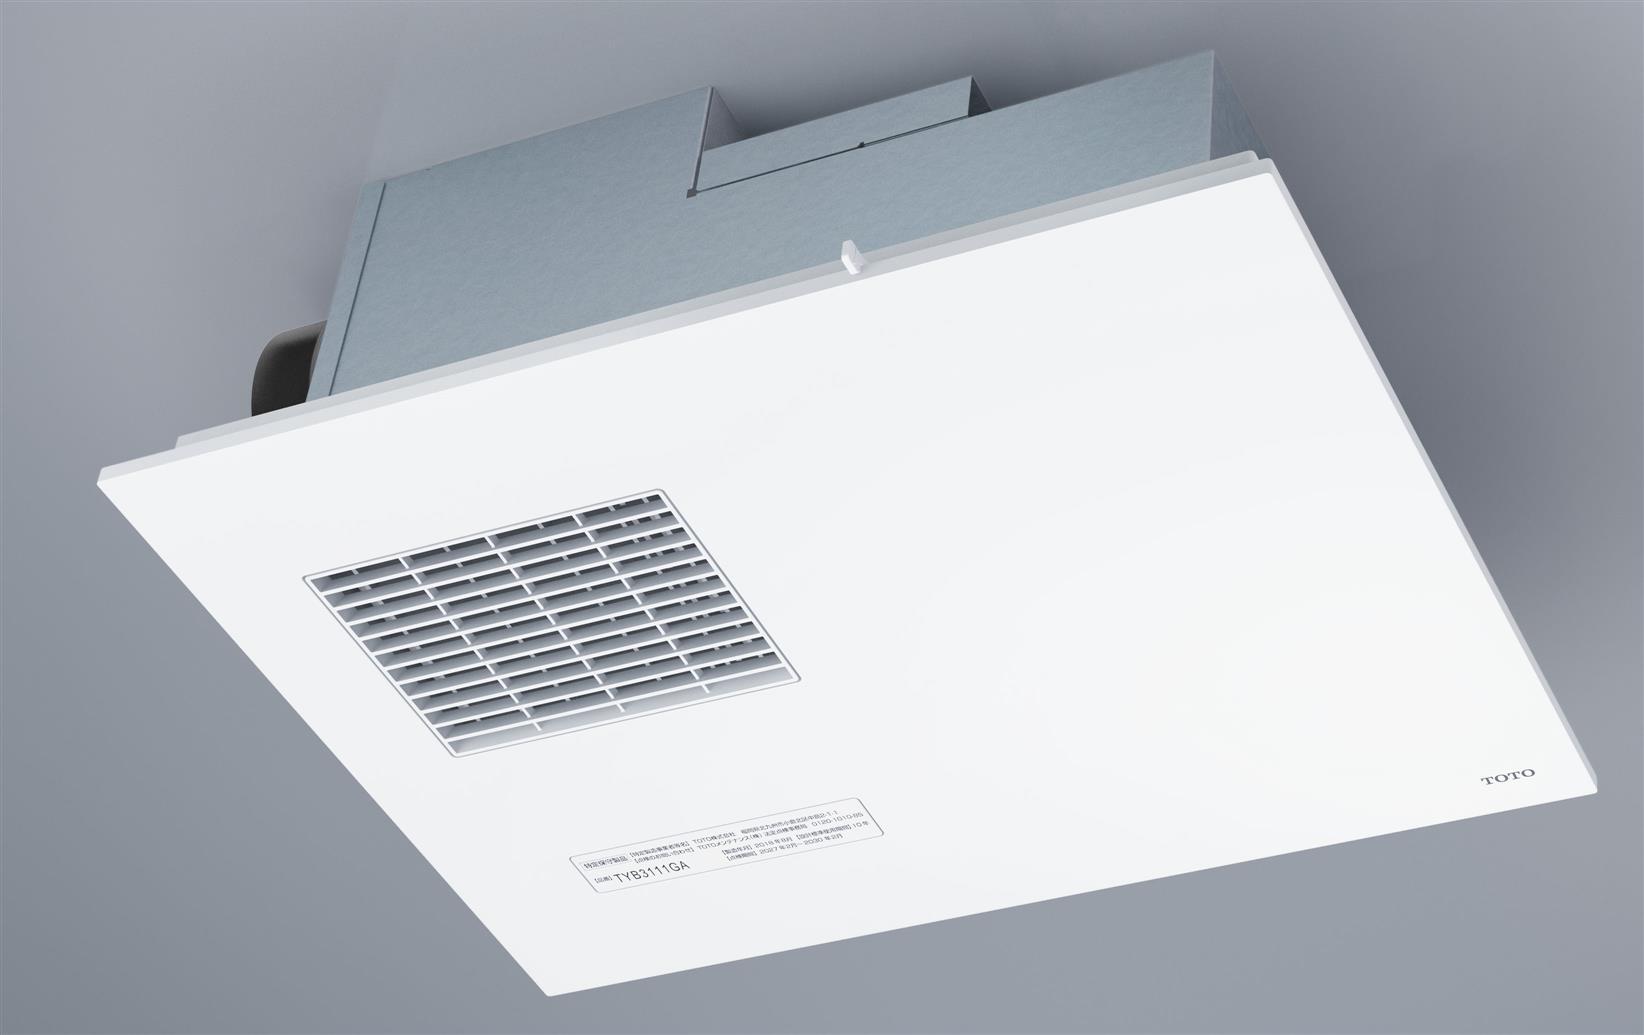 TOTO 浴室換気暖房乾燥機「三乾王」 1室換気...の商品画像